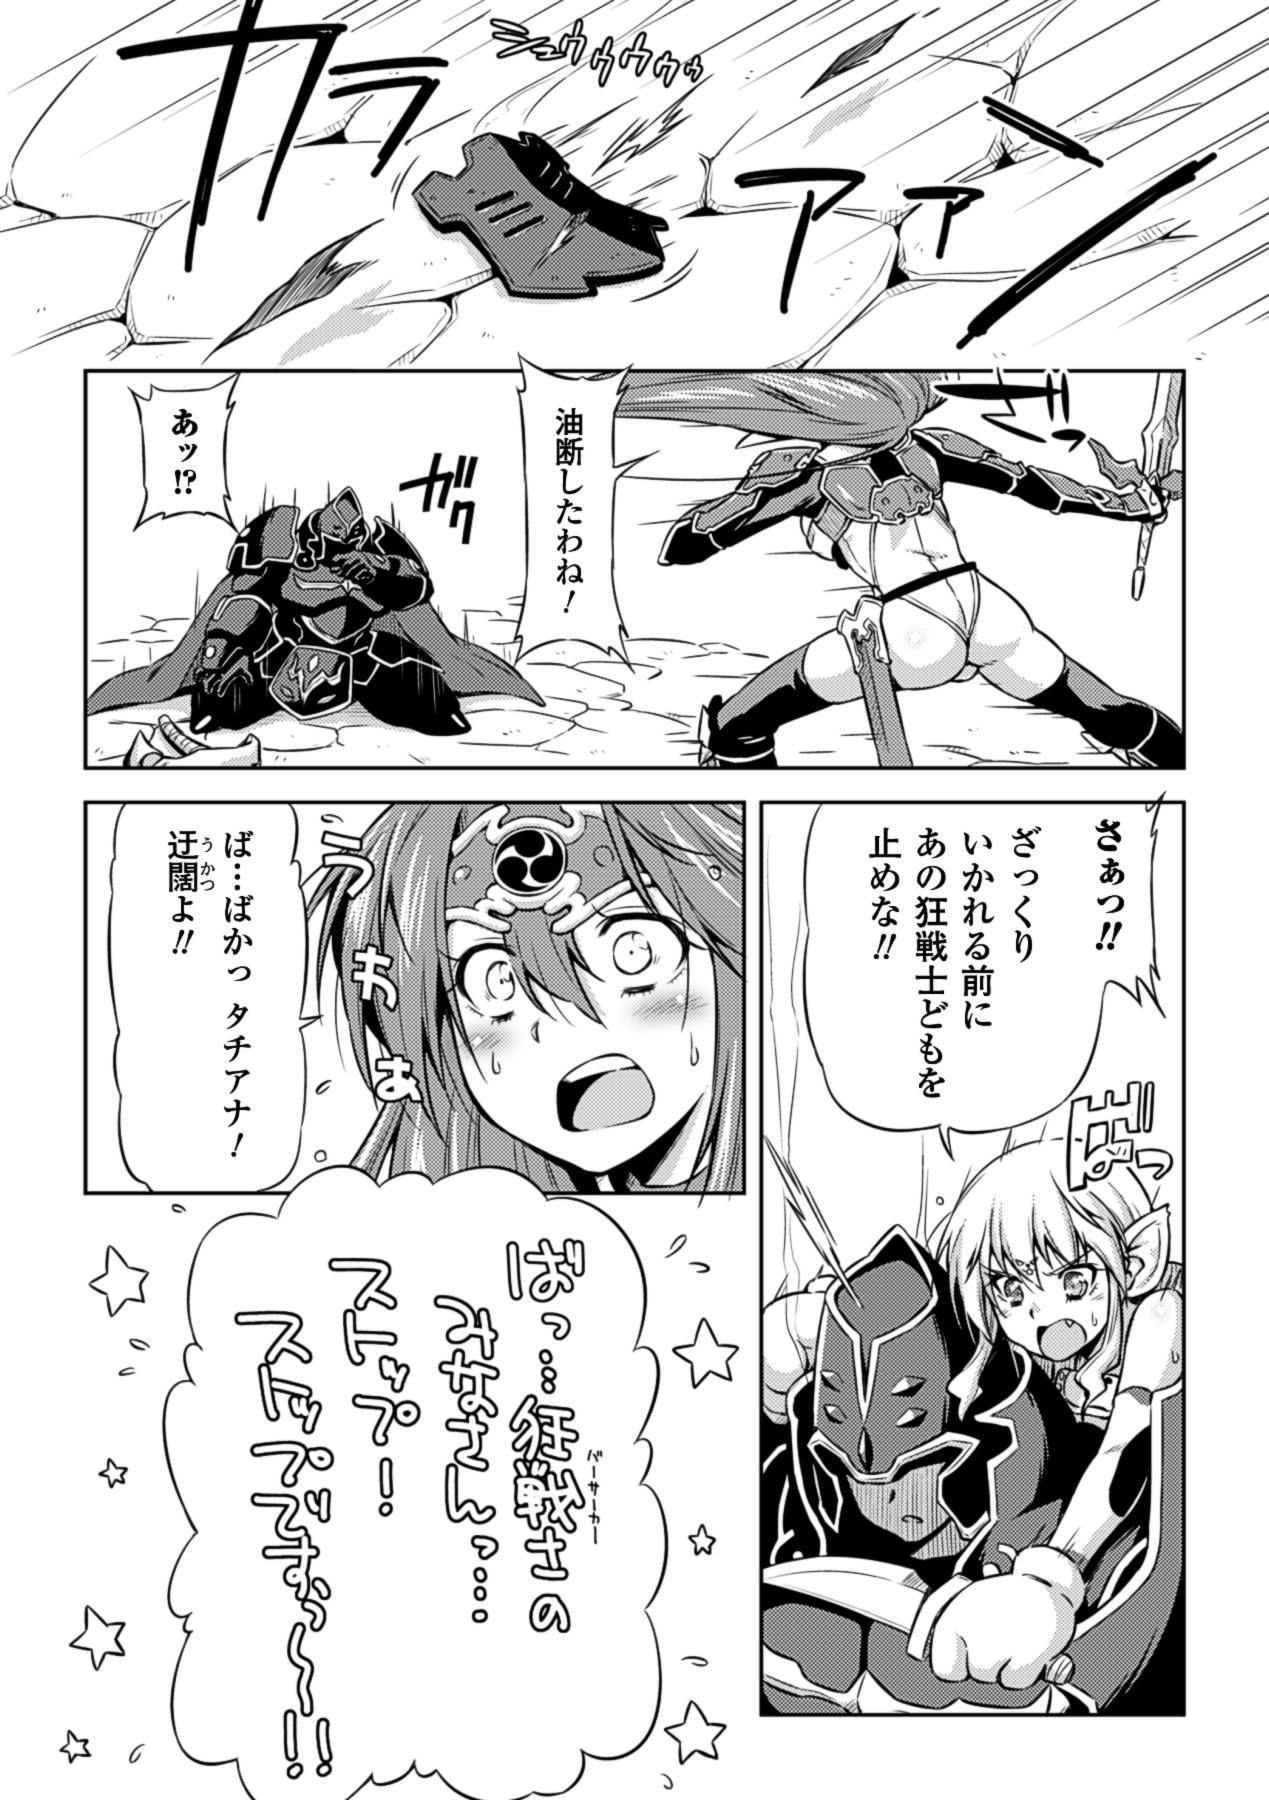 Megami Crisis 10 59